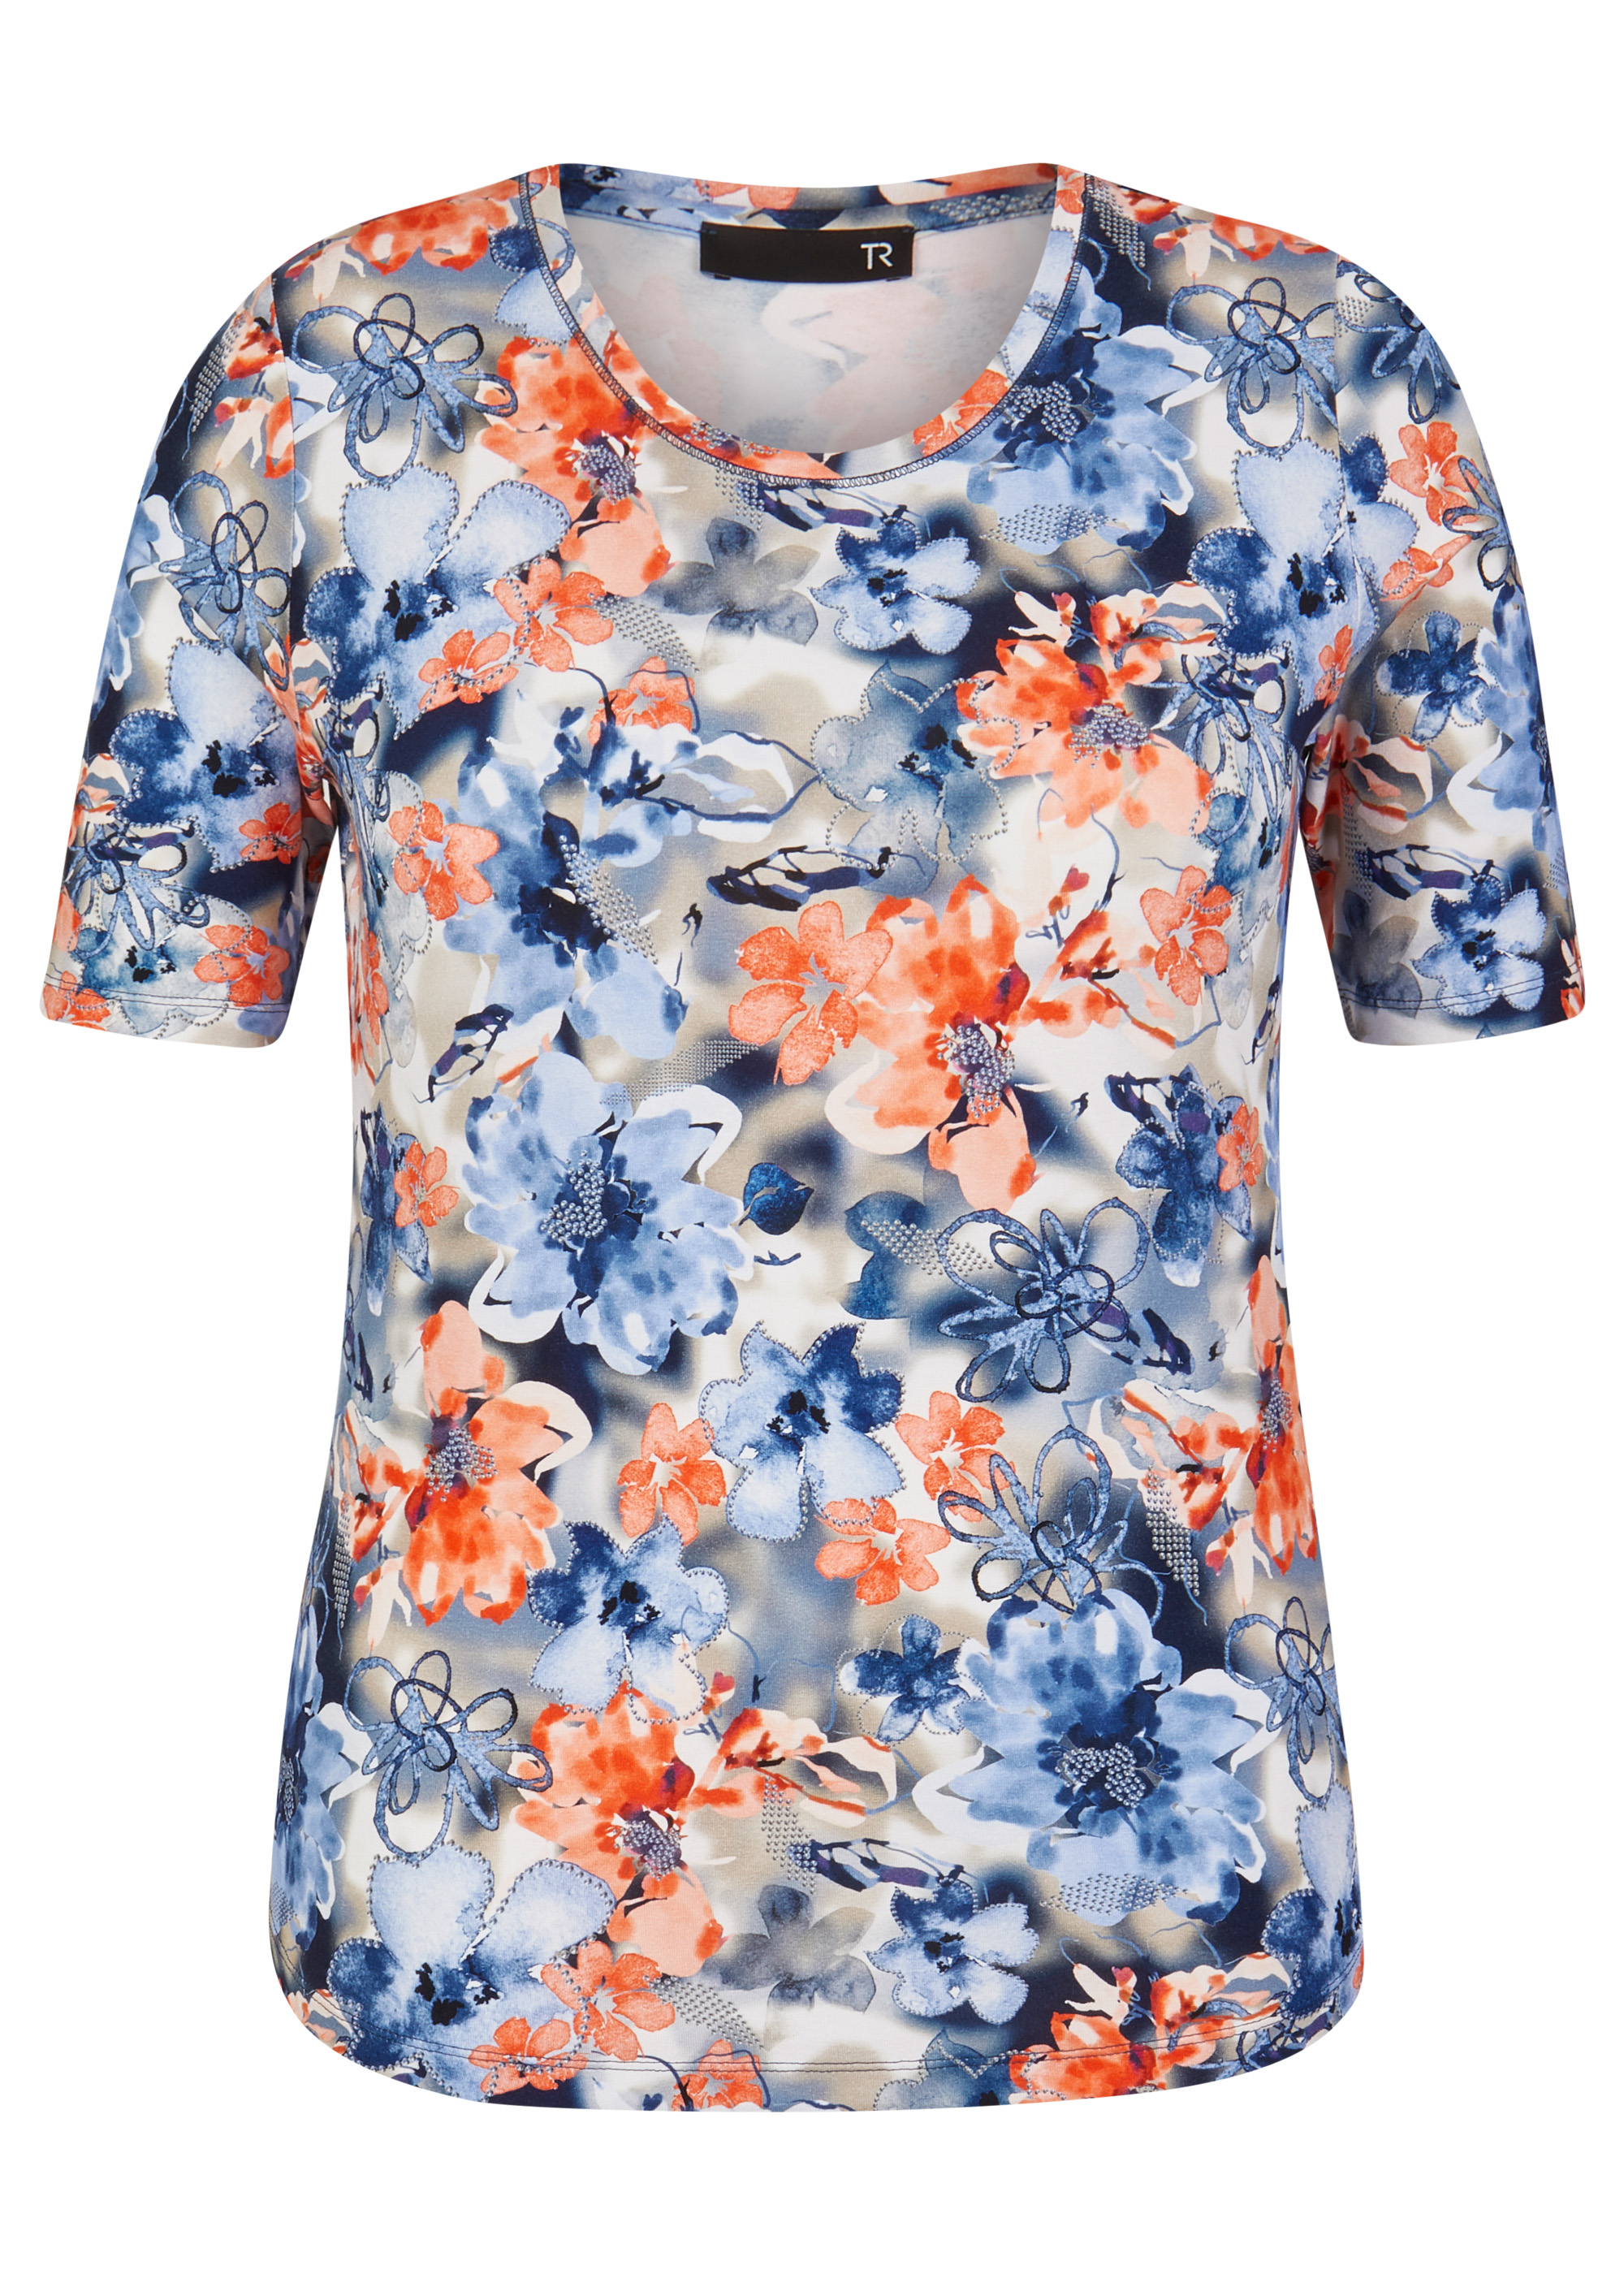 Rabe halbarm Shirt mit floralem Muster blau